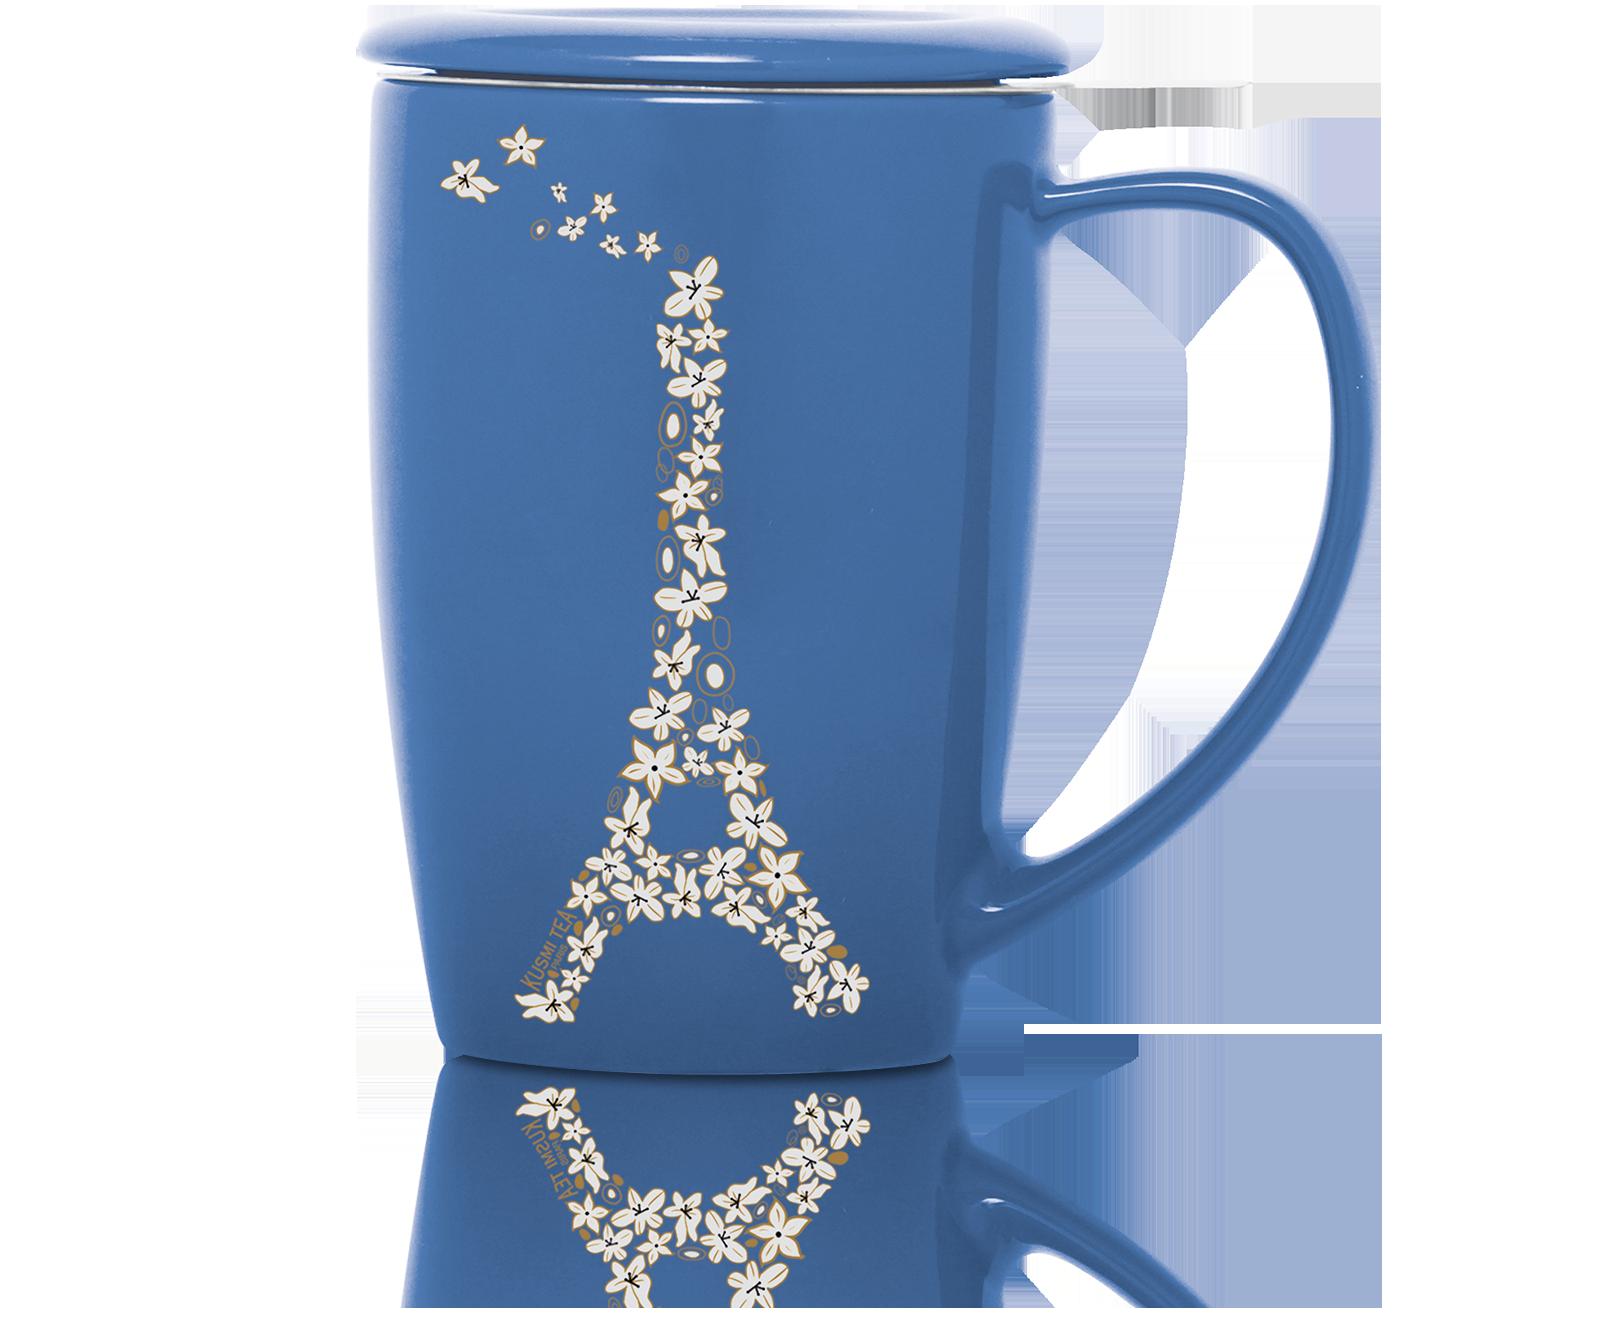 Tasse bleu marine Tour Eiffel Accessoire de Thé KUSMI TEA